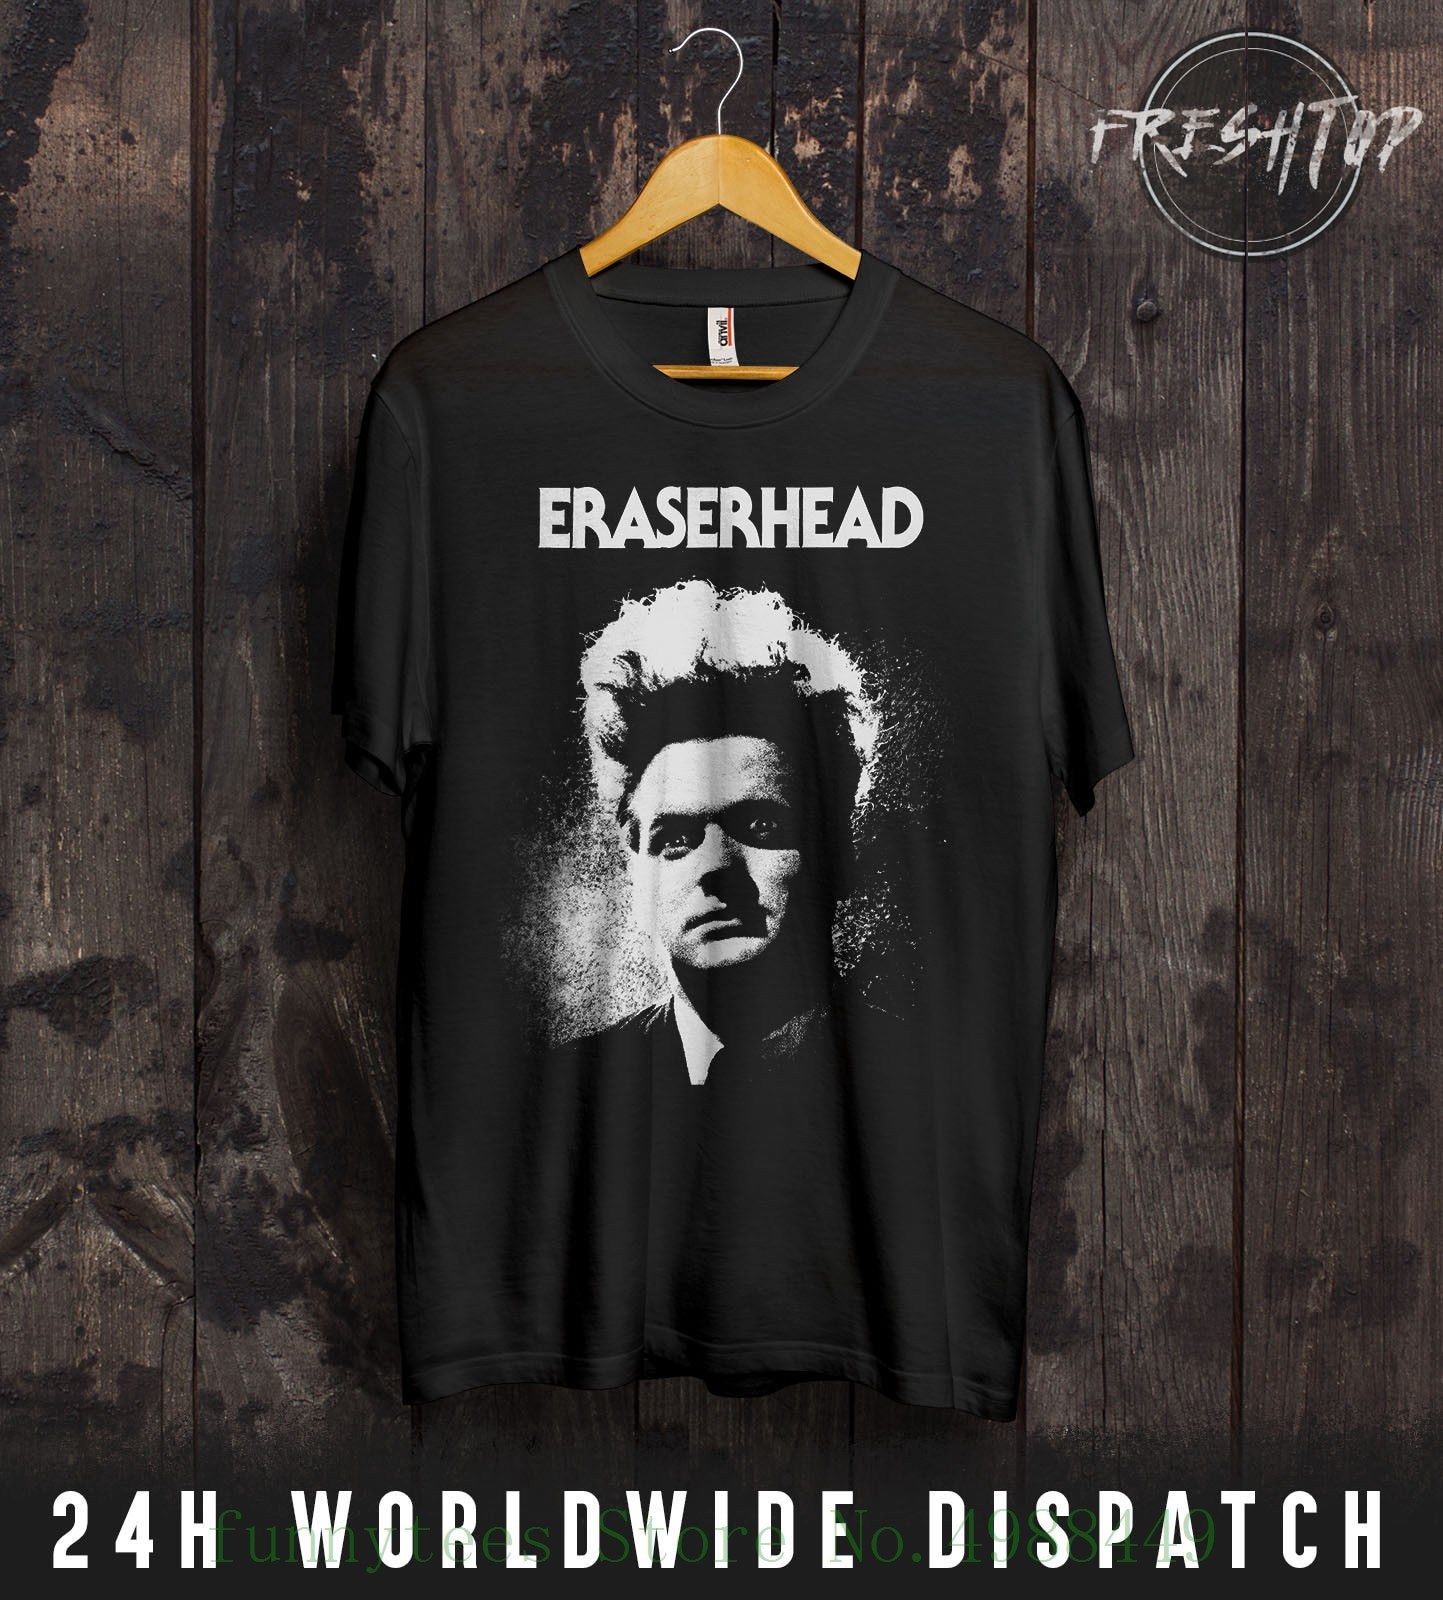 Camiseta Eraserhead de manga corta de algodón para jóvenes de David Lynch Cult Horror película Twin Peaks Gift S - Xxxl